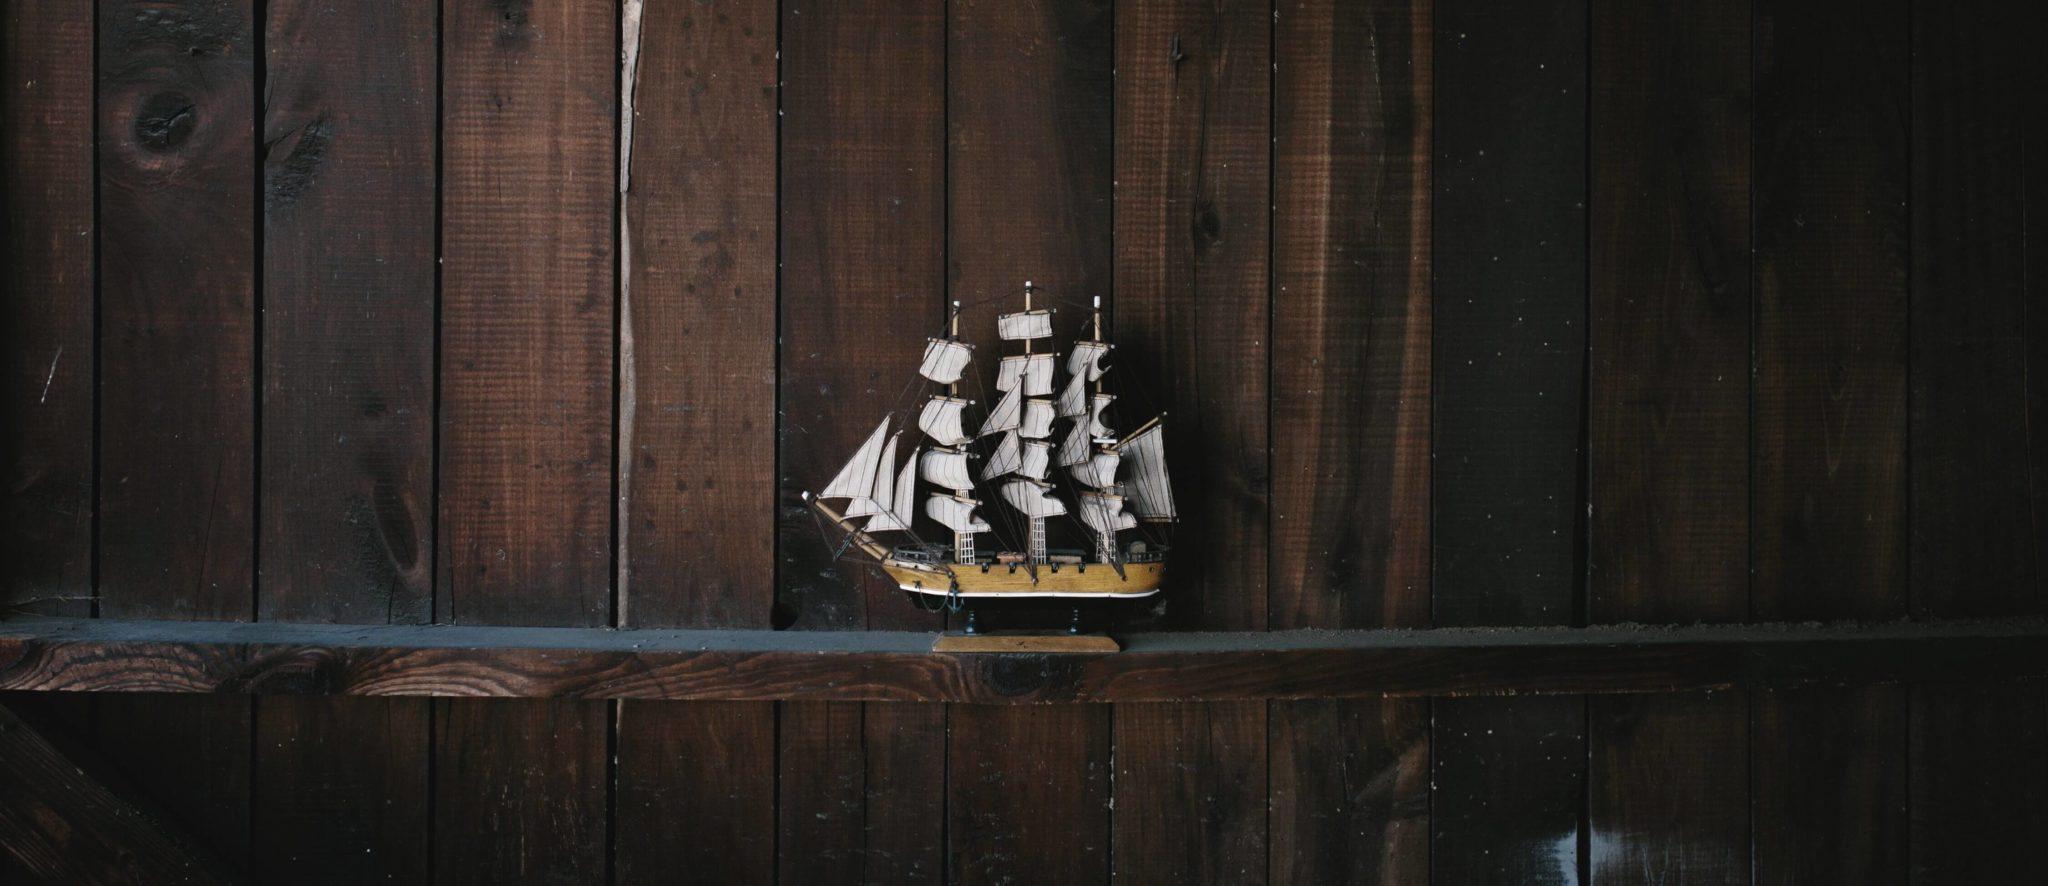 Mood-Setting des Wheel of Spirits zum Thema Rum